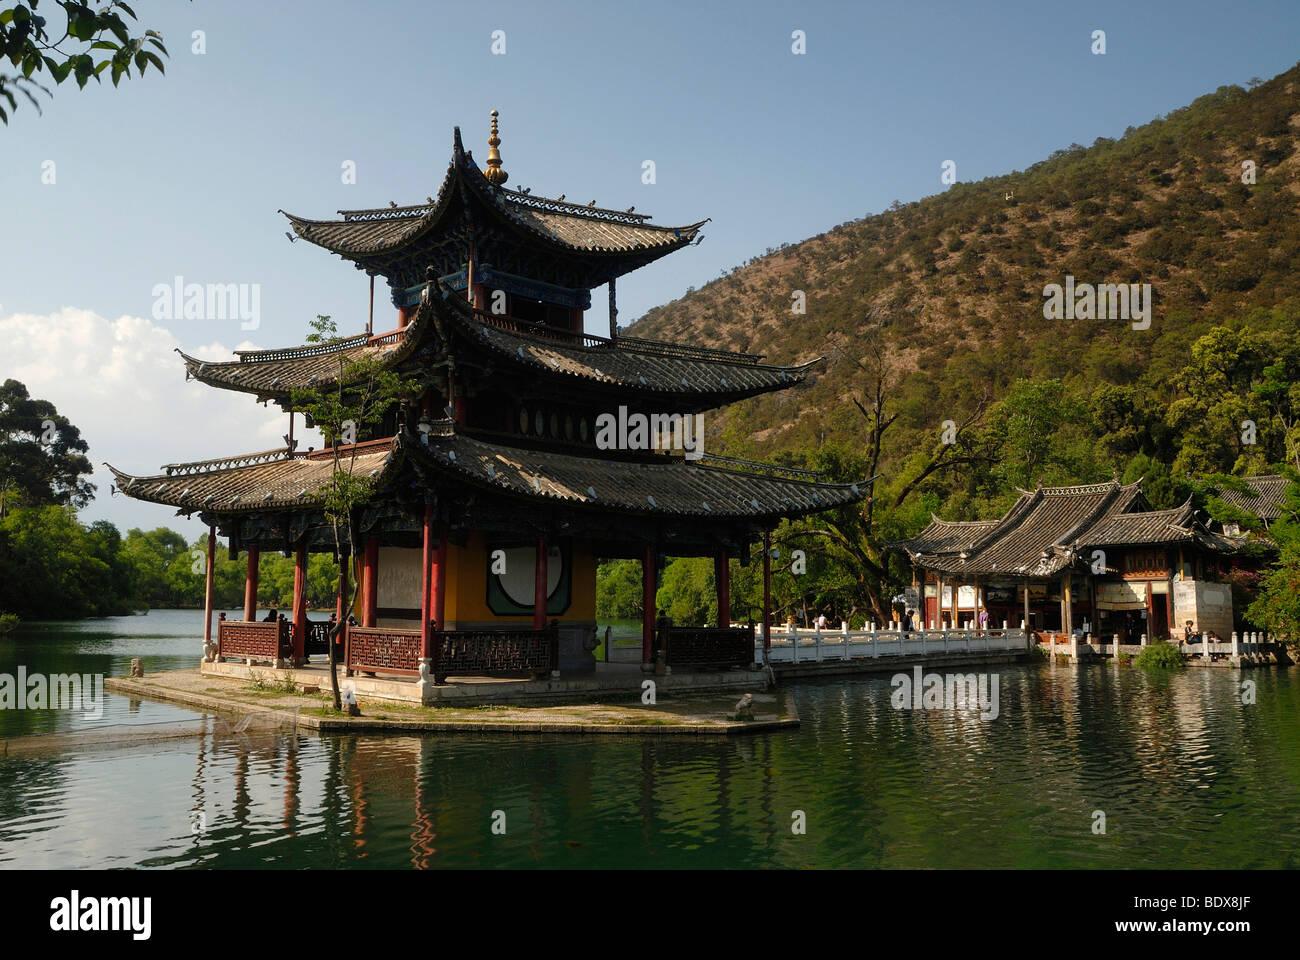 Pagoda of the Black Dragon Pool in front of the Jade Dragon Snow Mountain, Yu Long Xue Shan, 5596 m, Lijiang, Yunnan, - Stock Image